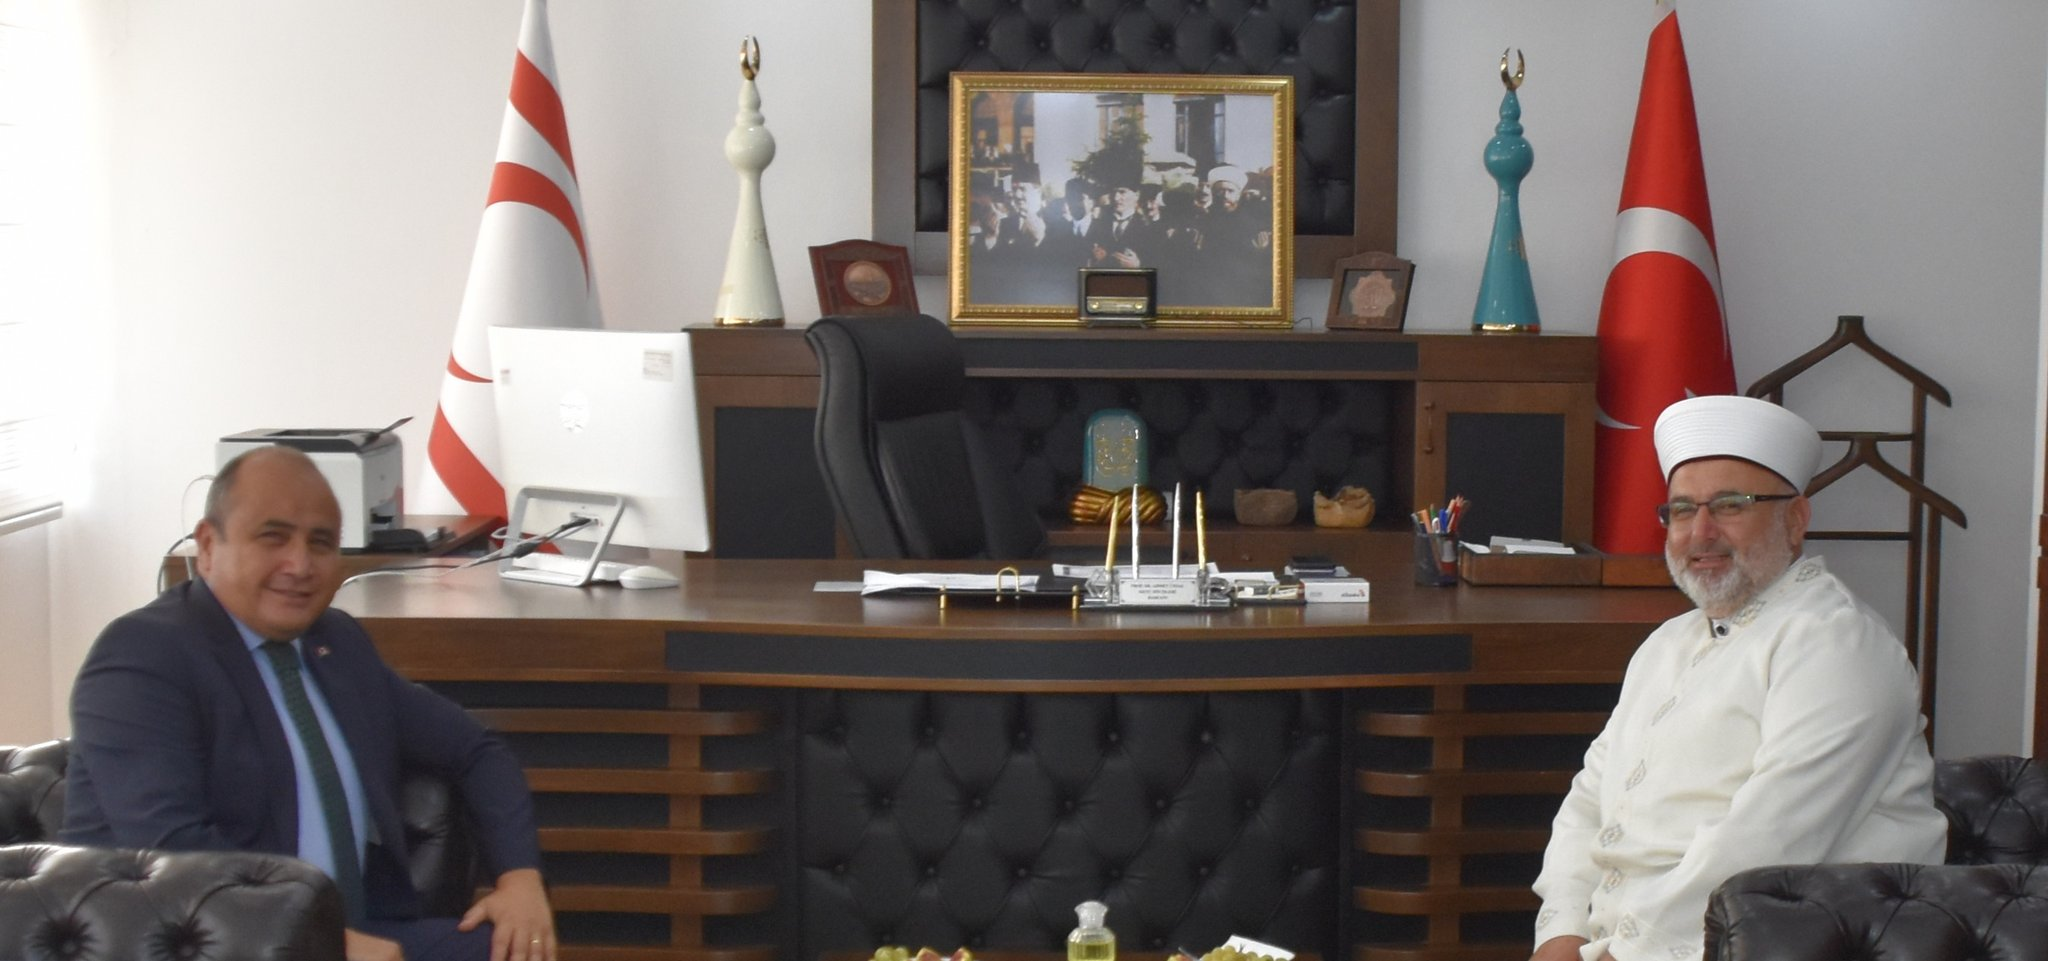 BAŞÇERİ'DEN ÜNSAL'A İADE-İ ZİYARET